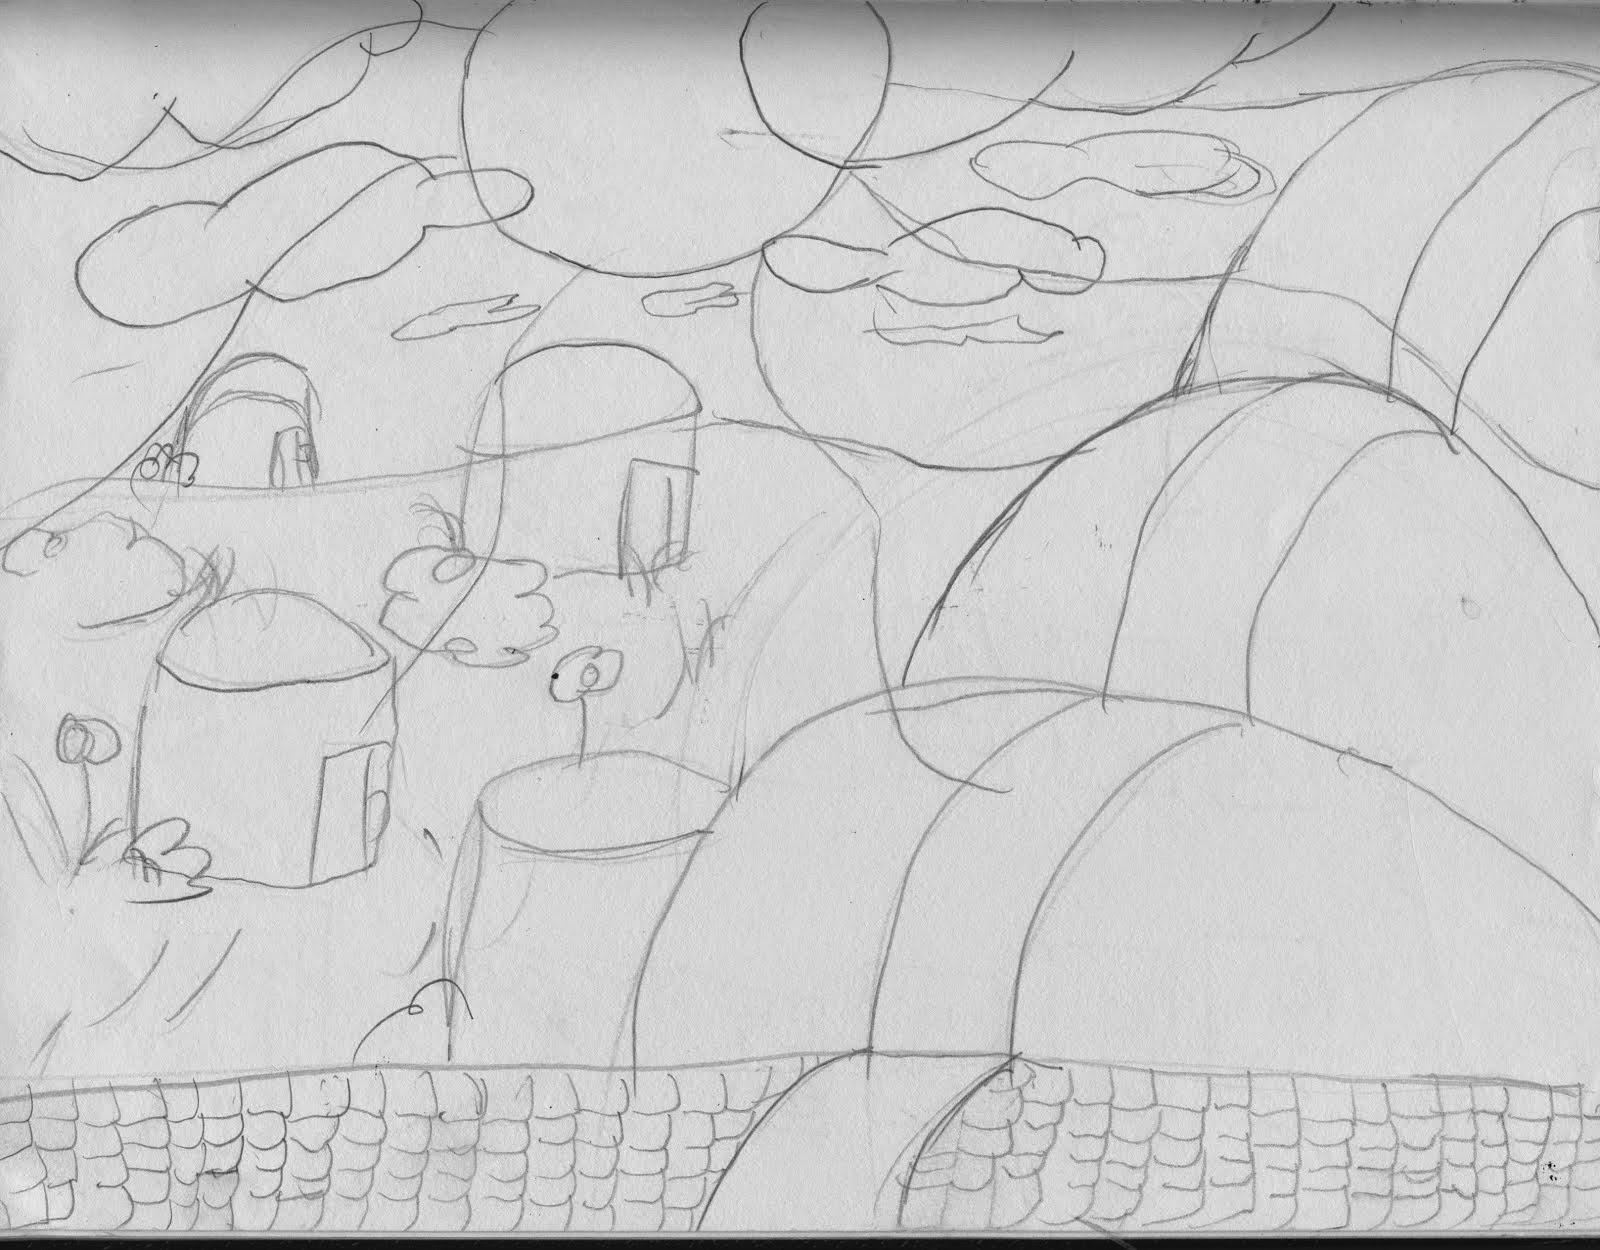 Environment of Dragon vs. Dragonkin